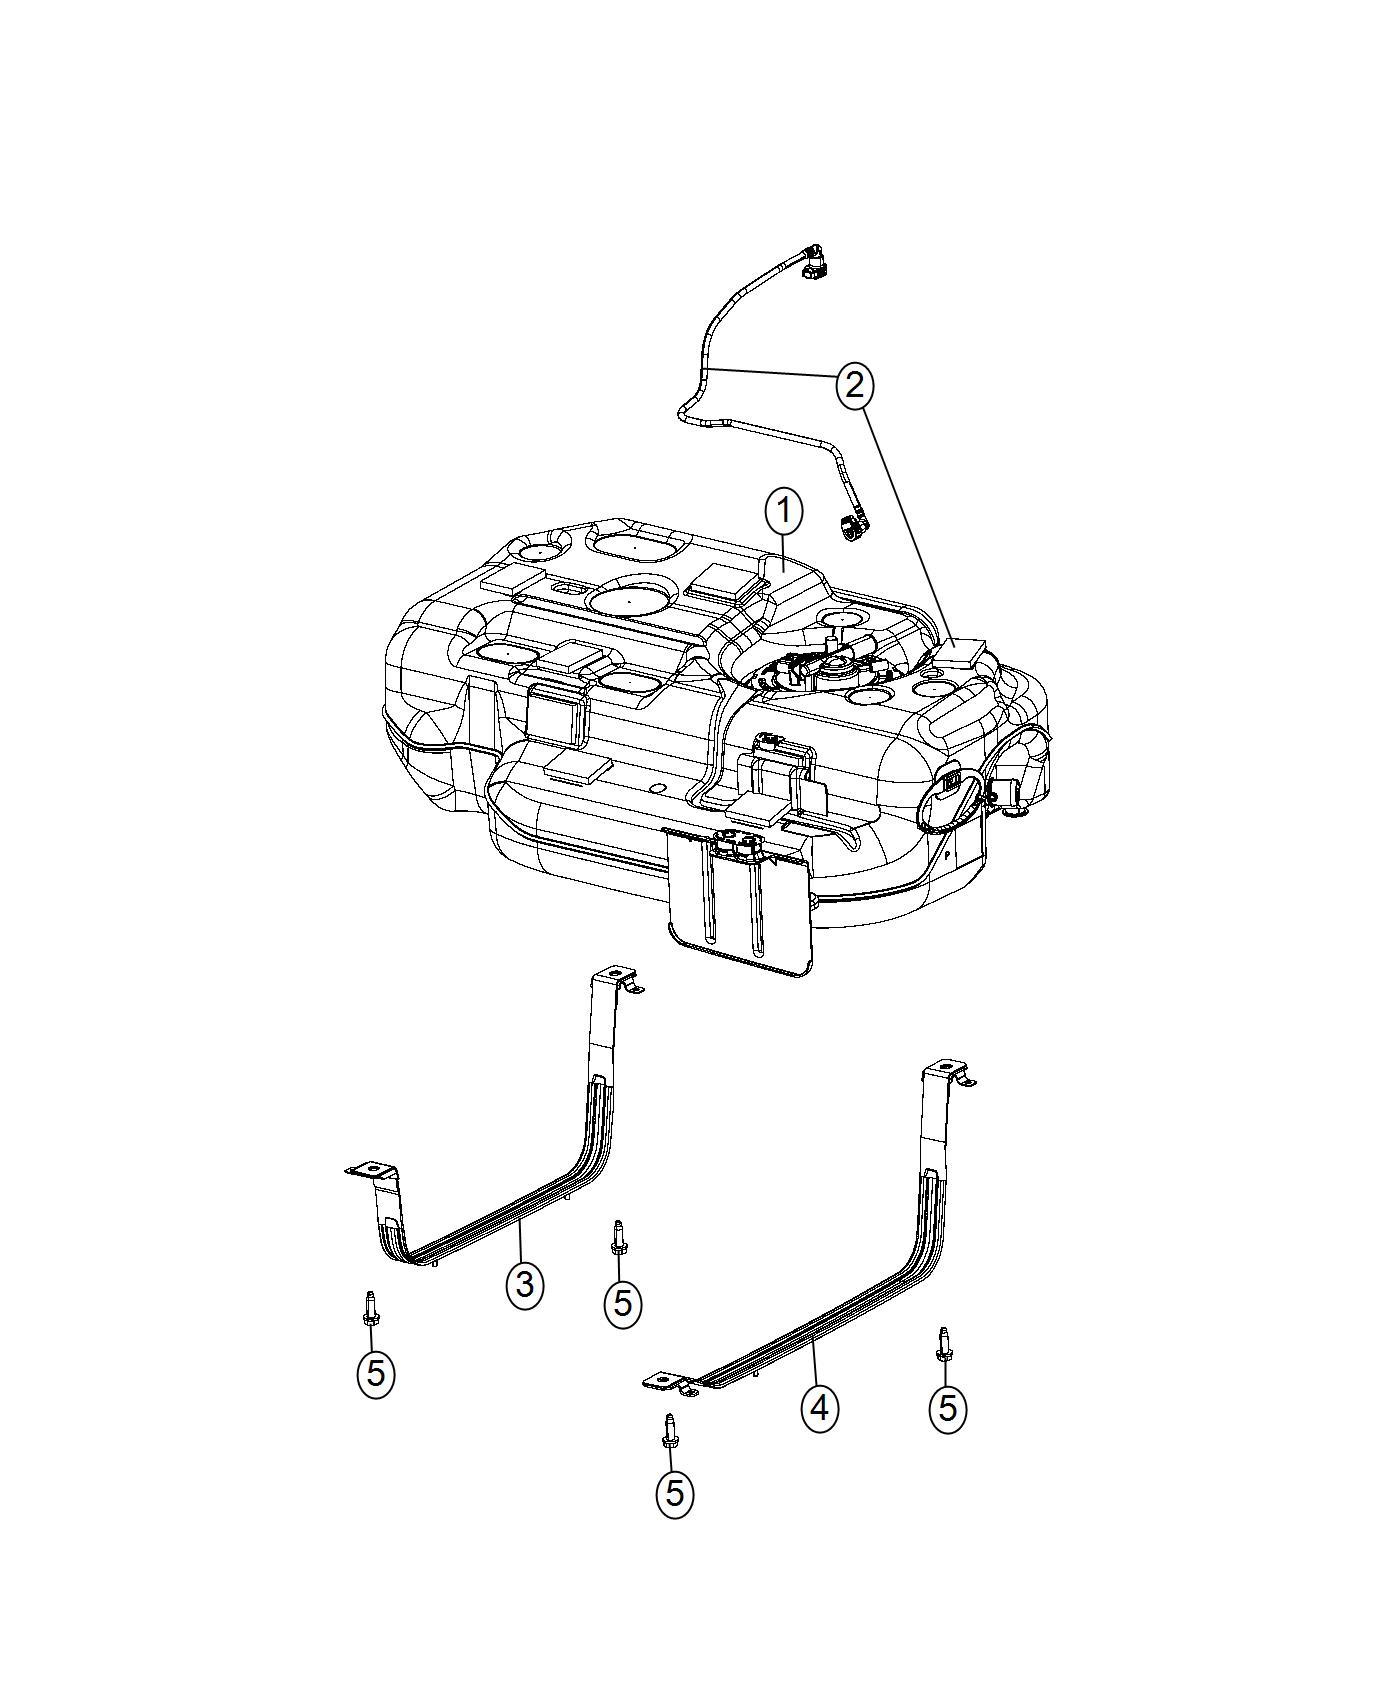 Chrysler Pacifica Tank Fuel 19 Gallon Fuel Tank